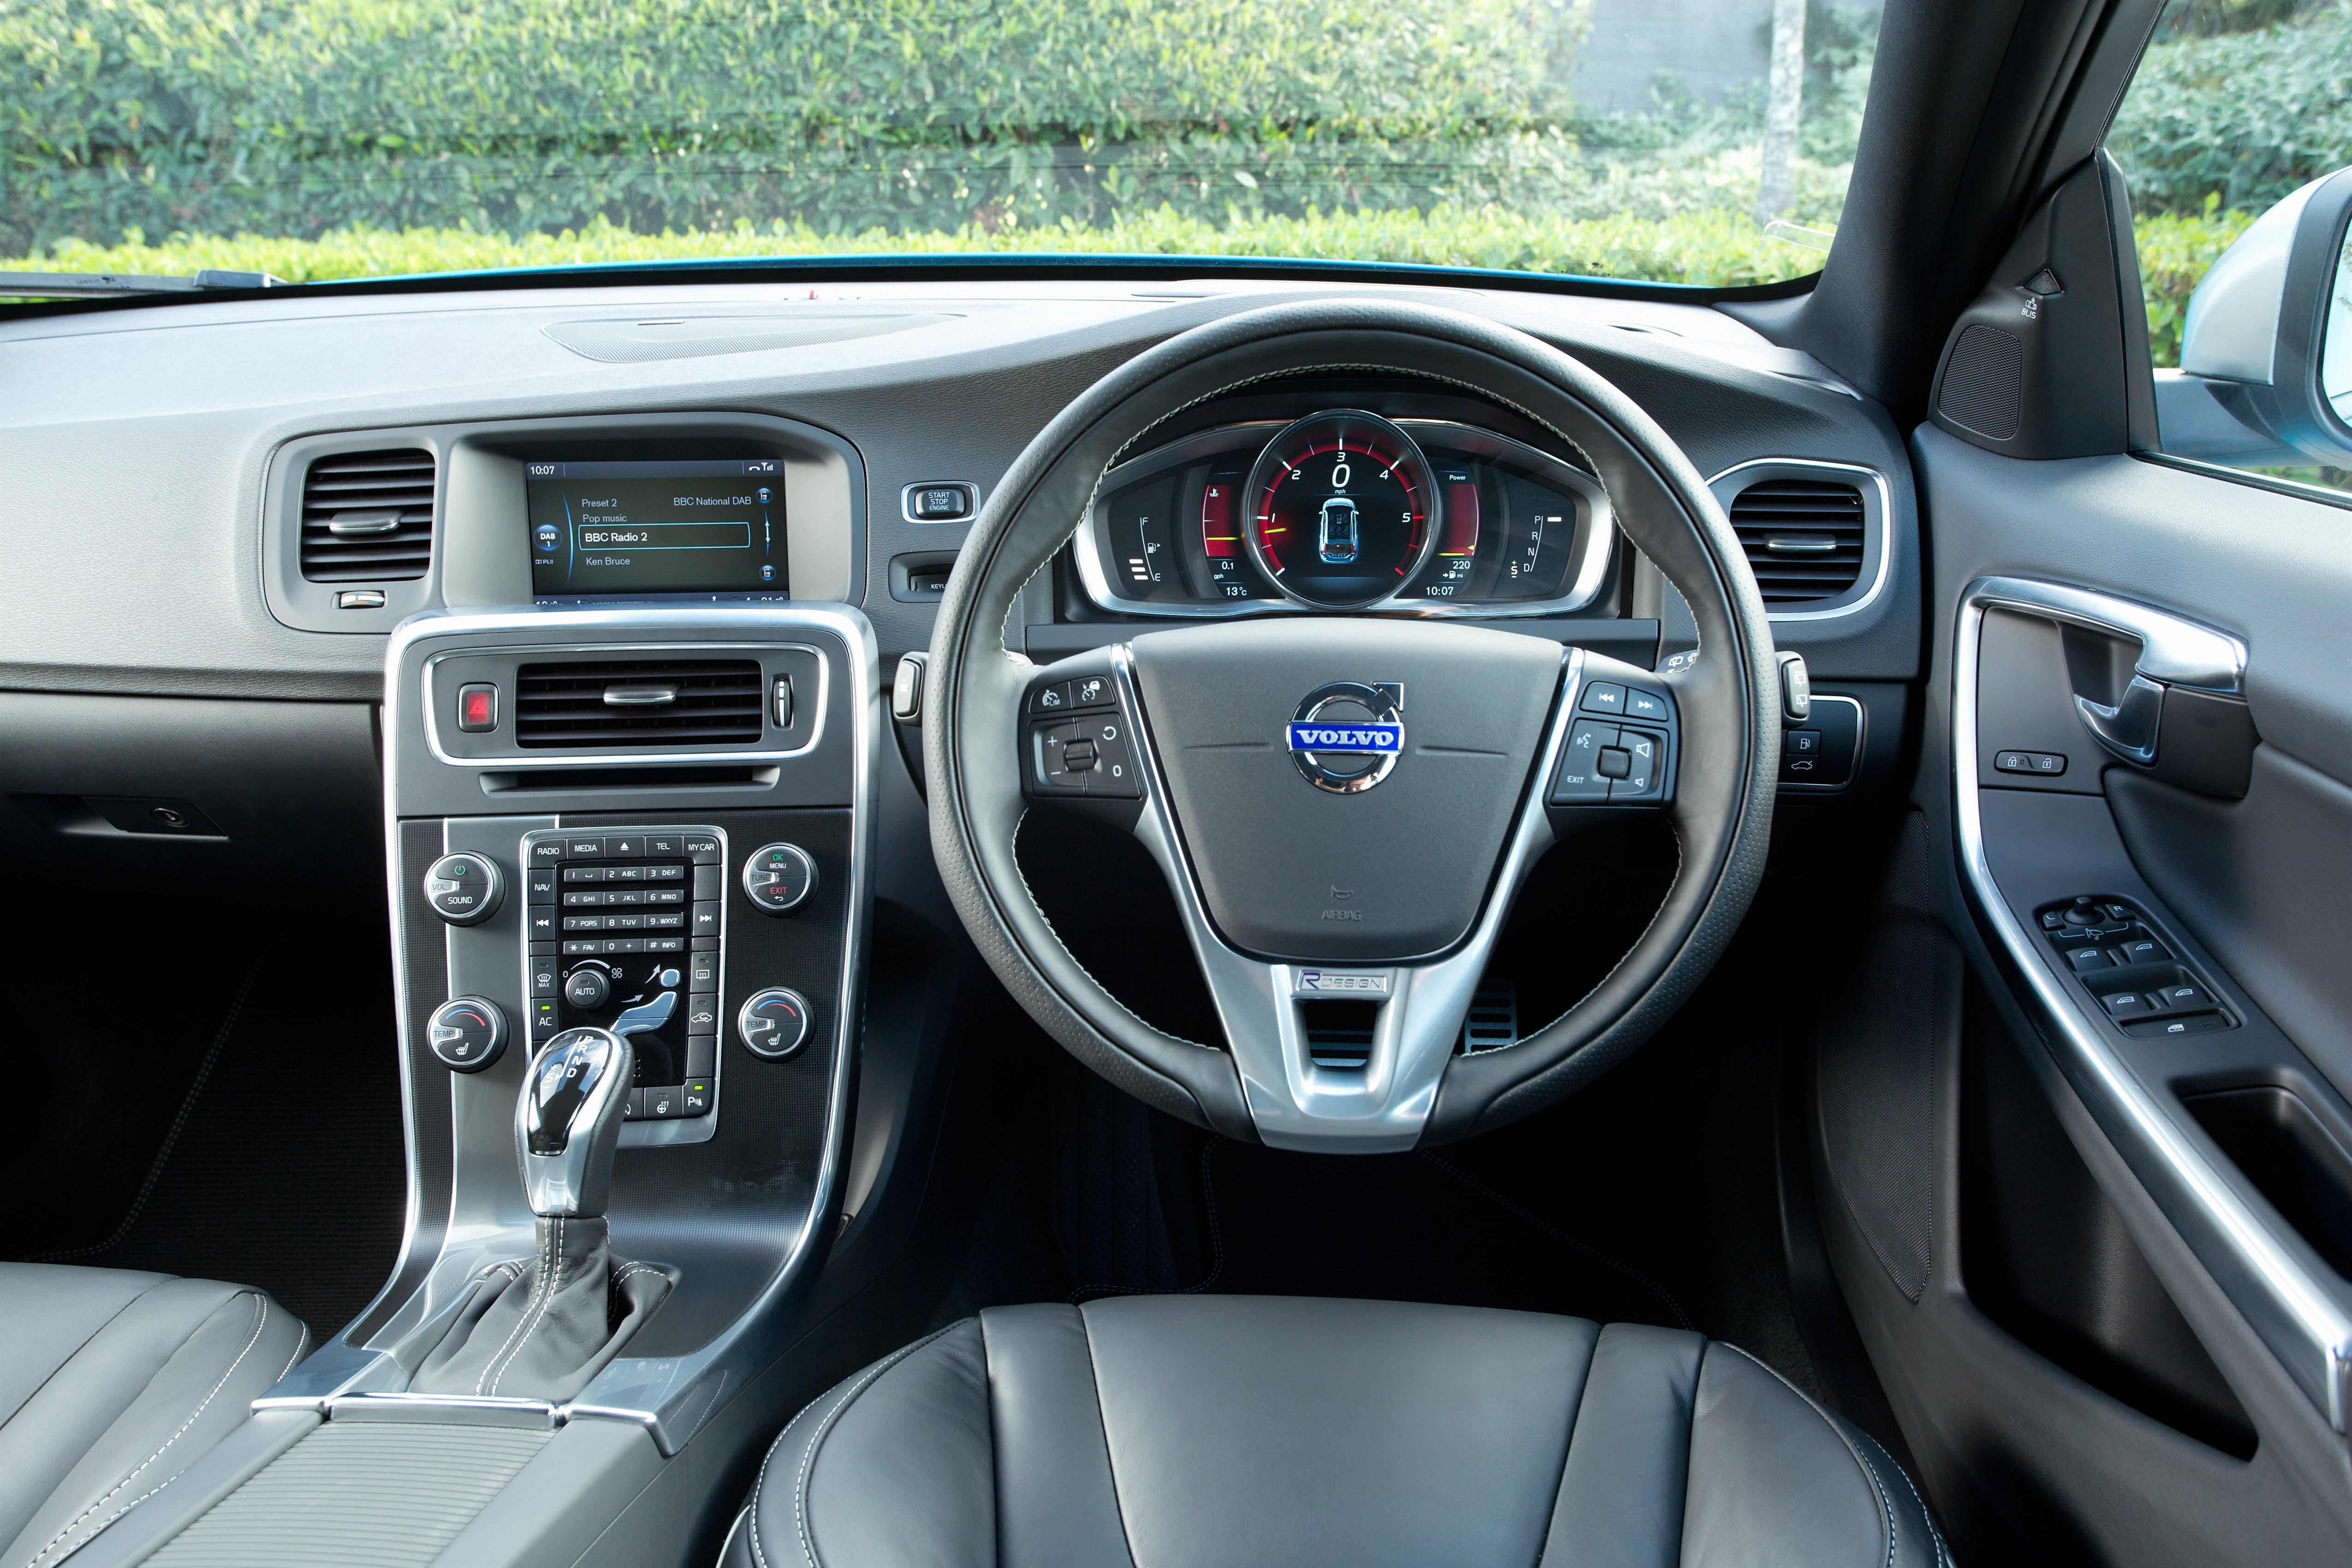 Volvo V60 Driver's Seat